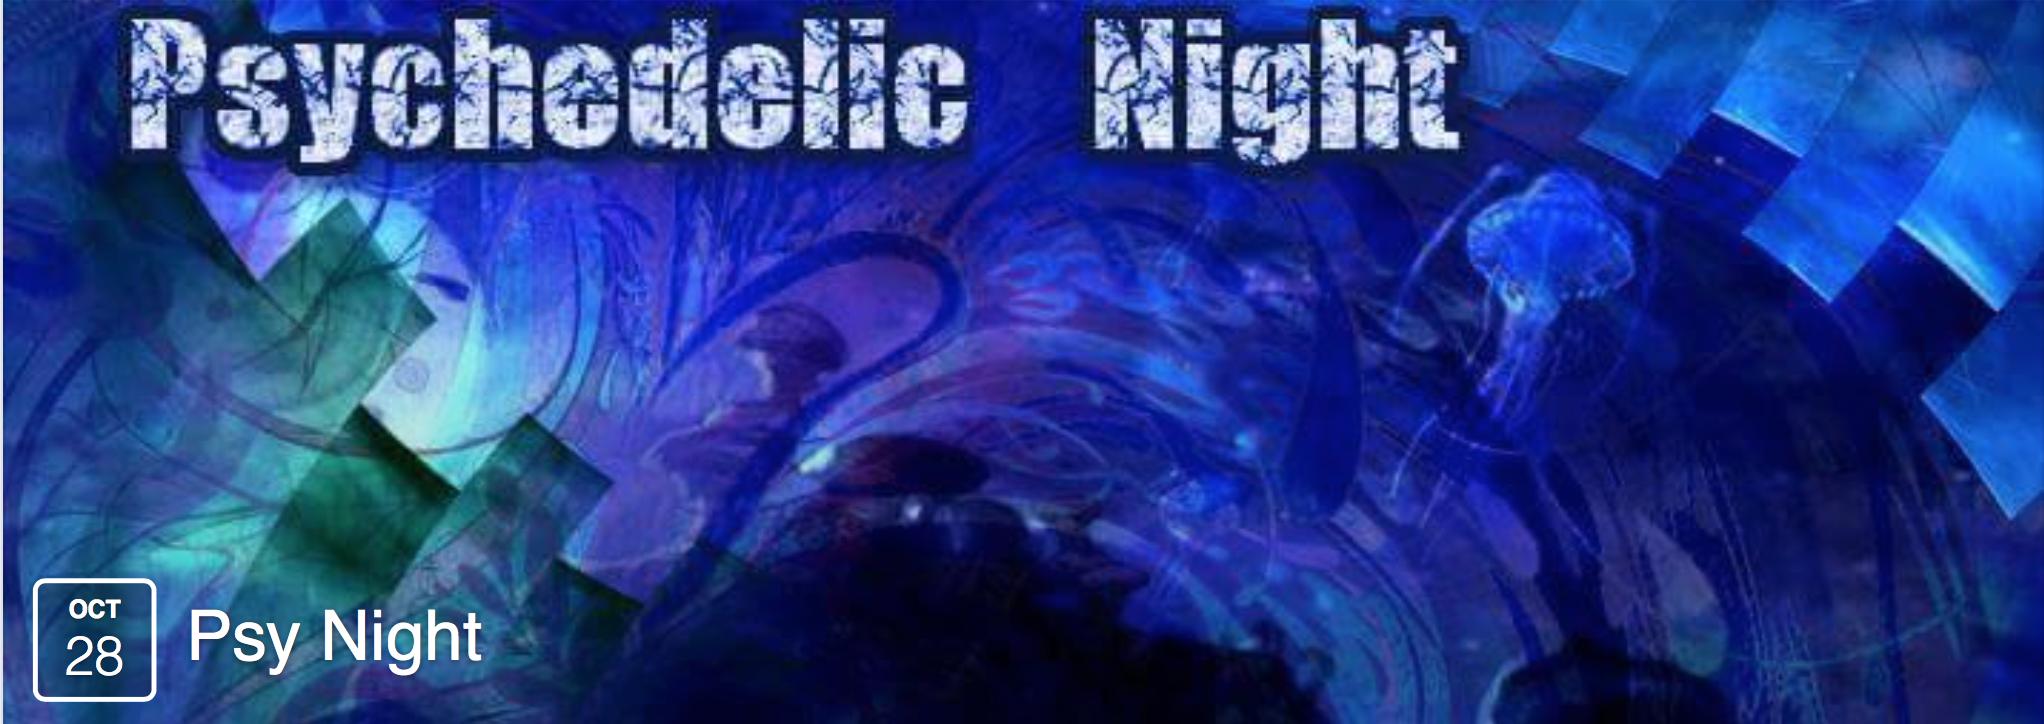 161028_psy-night-flyer